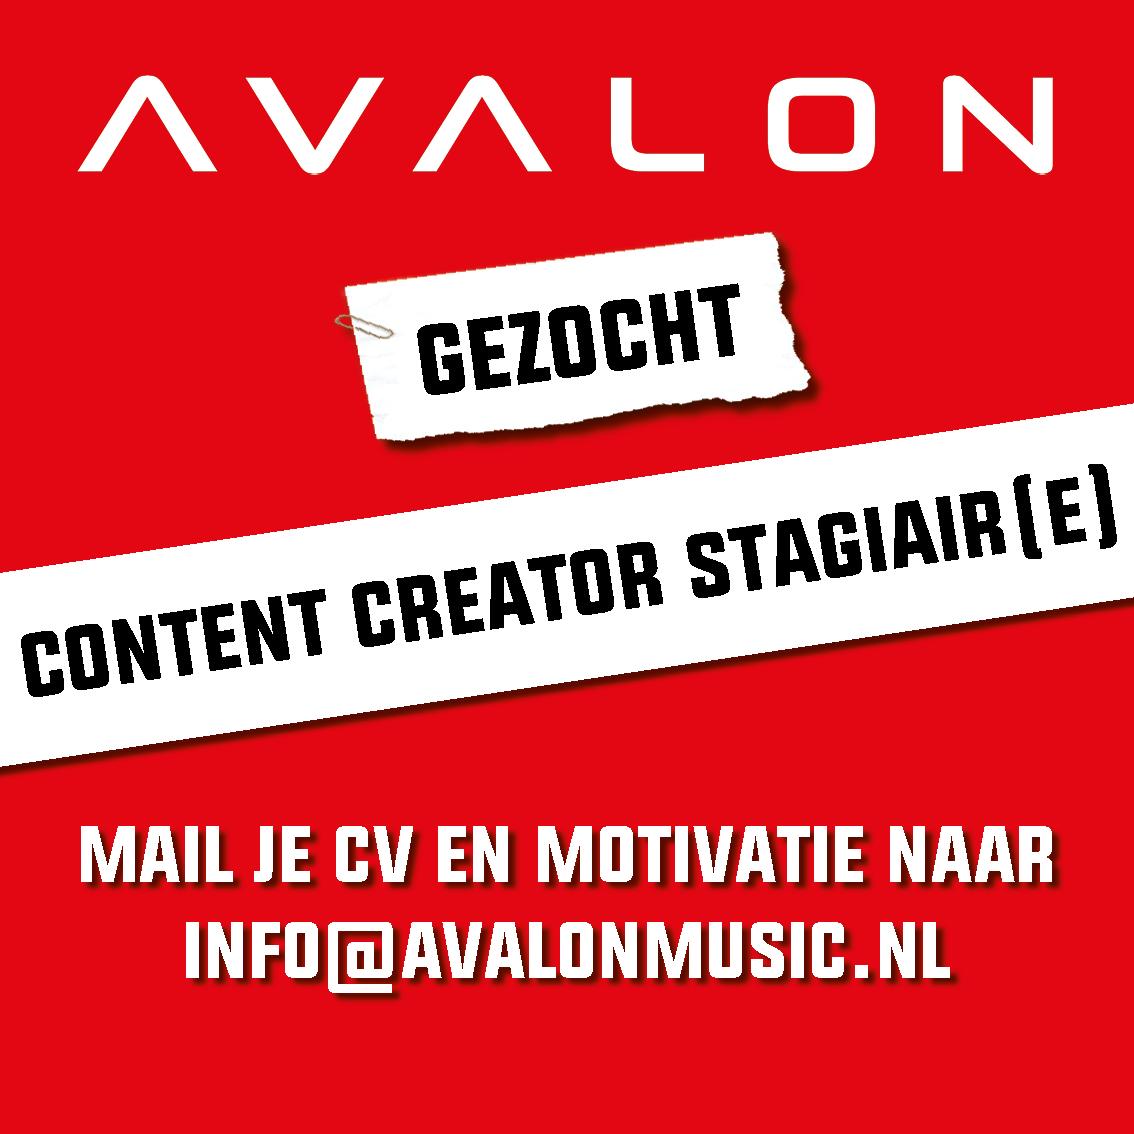 Stagiaire gezocht: Content Creator